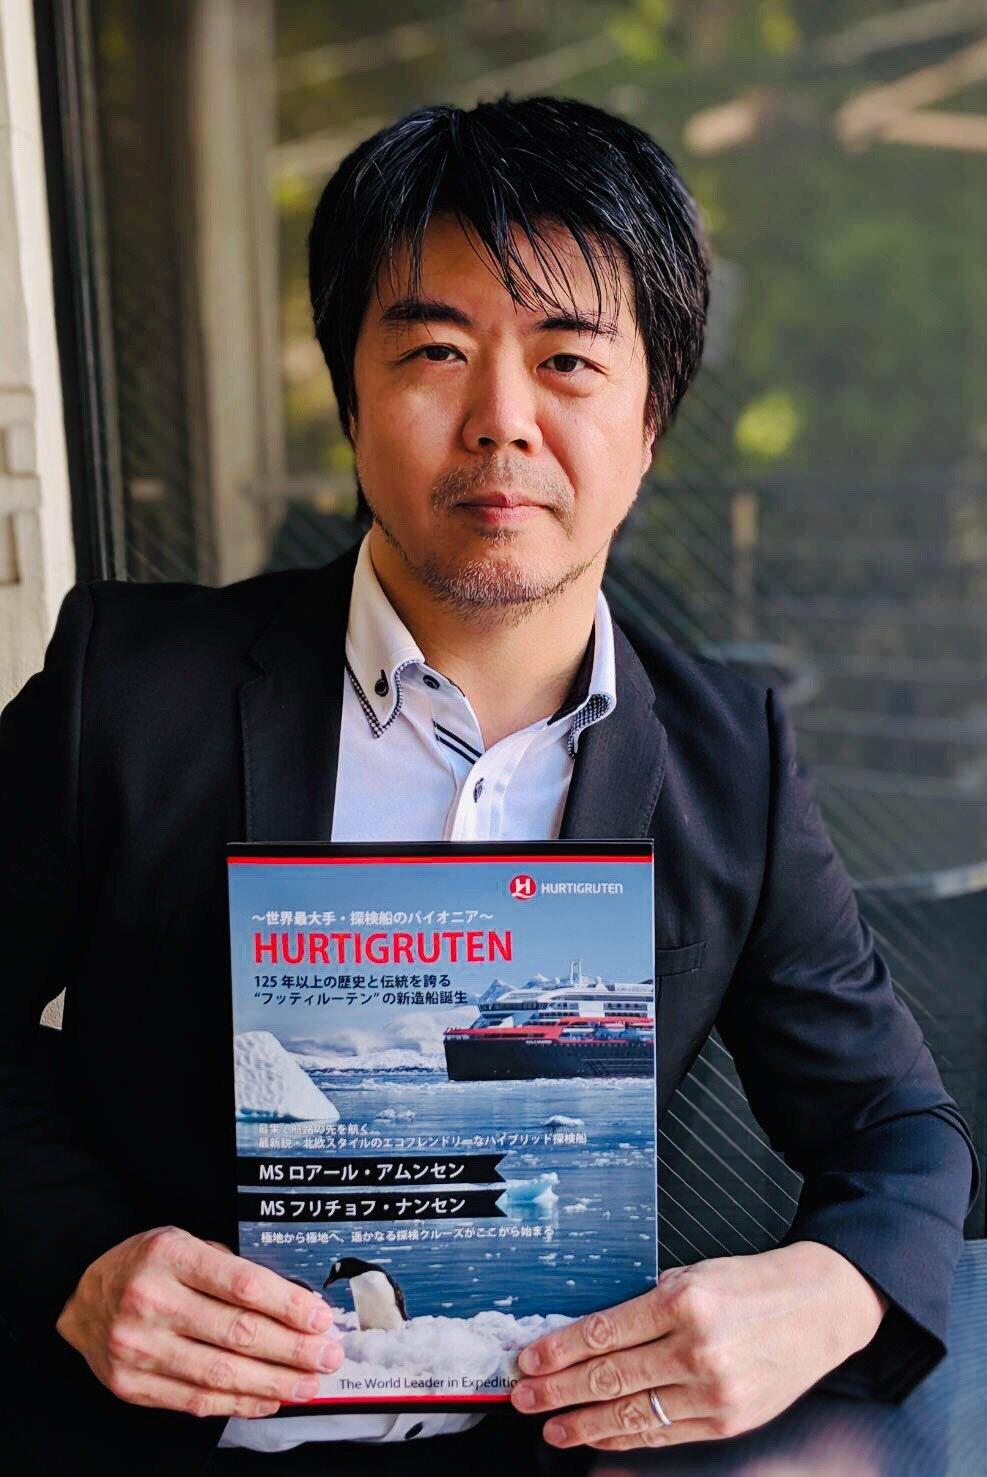 Hurtigruten's Japan-representative, Kengo Kuno